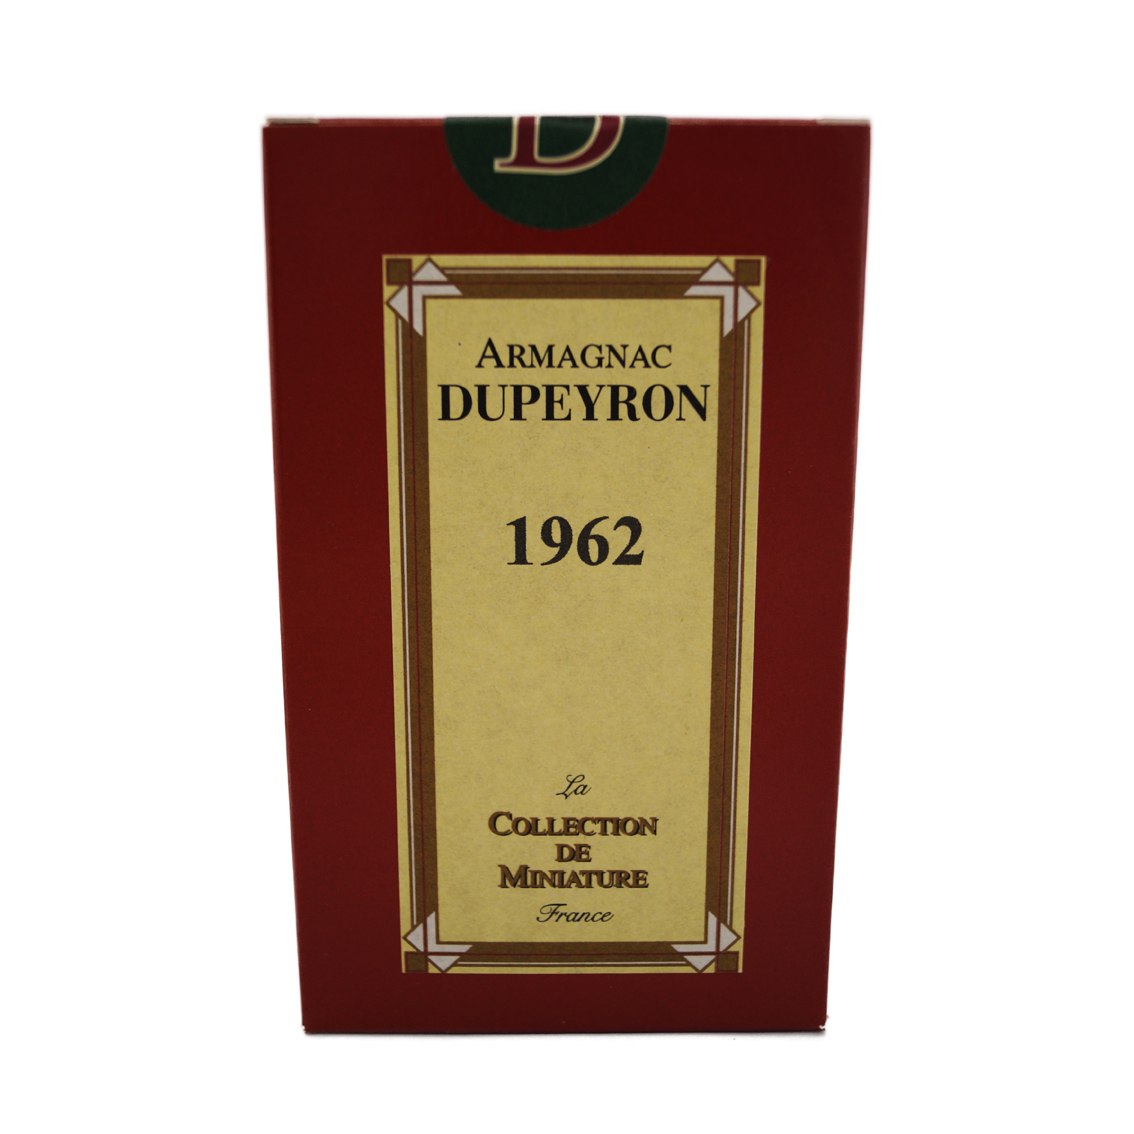 ARMAGNAC-DUPEYRON-1962-B